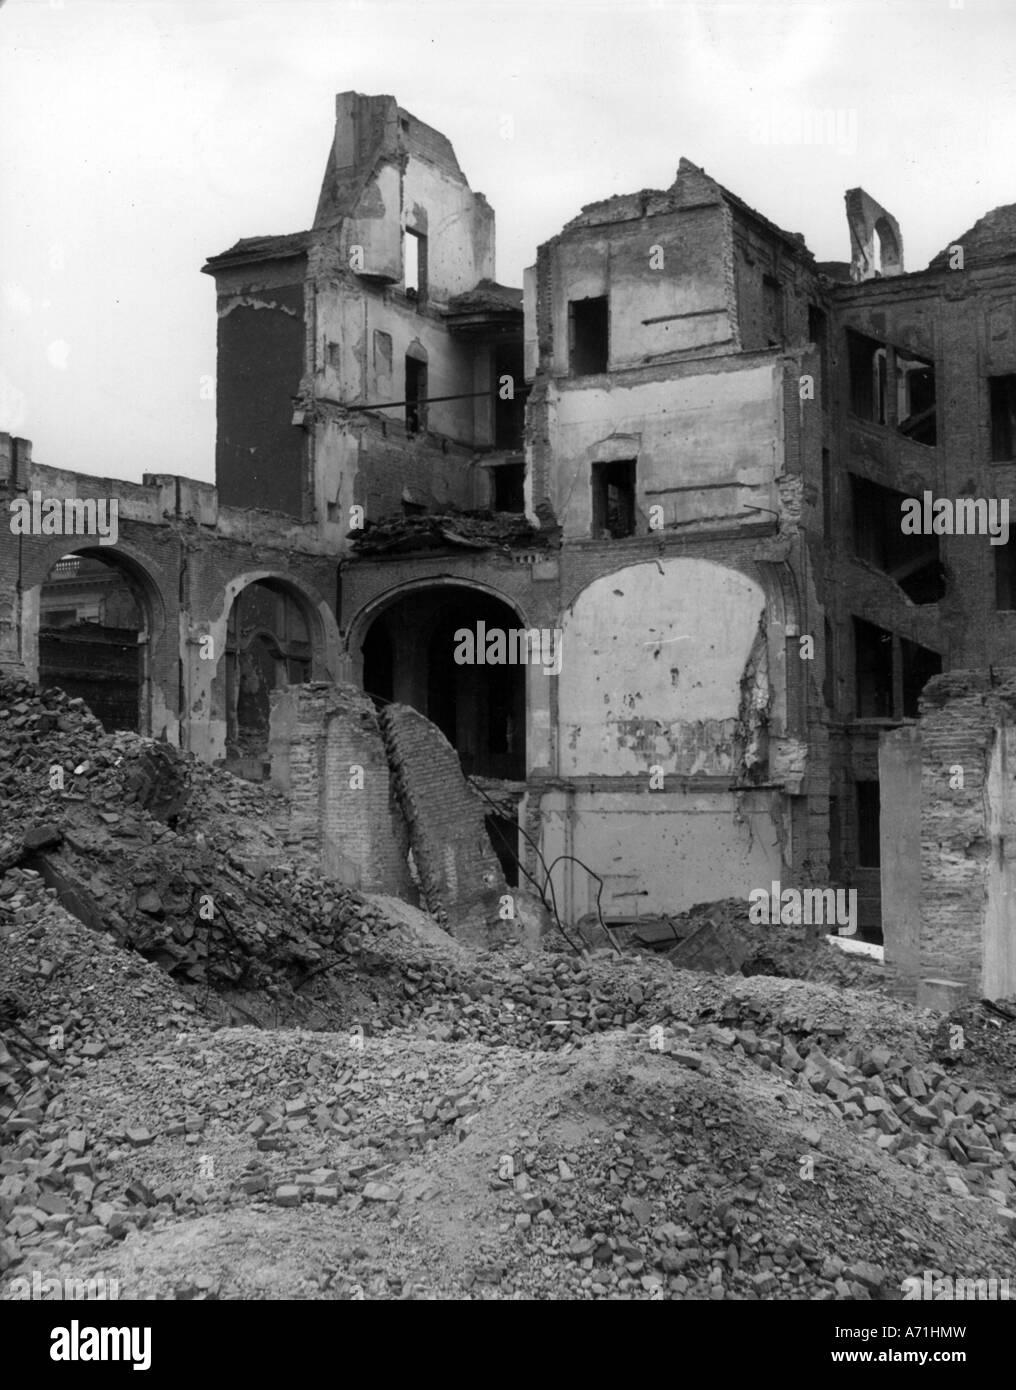 events, post war era, destroyed cities, Berlin, former headquarter of the Gestapo, Prinz-Albrecht-Strasse, 1948, - Stock Image